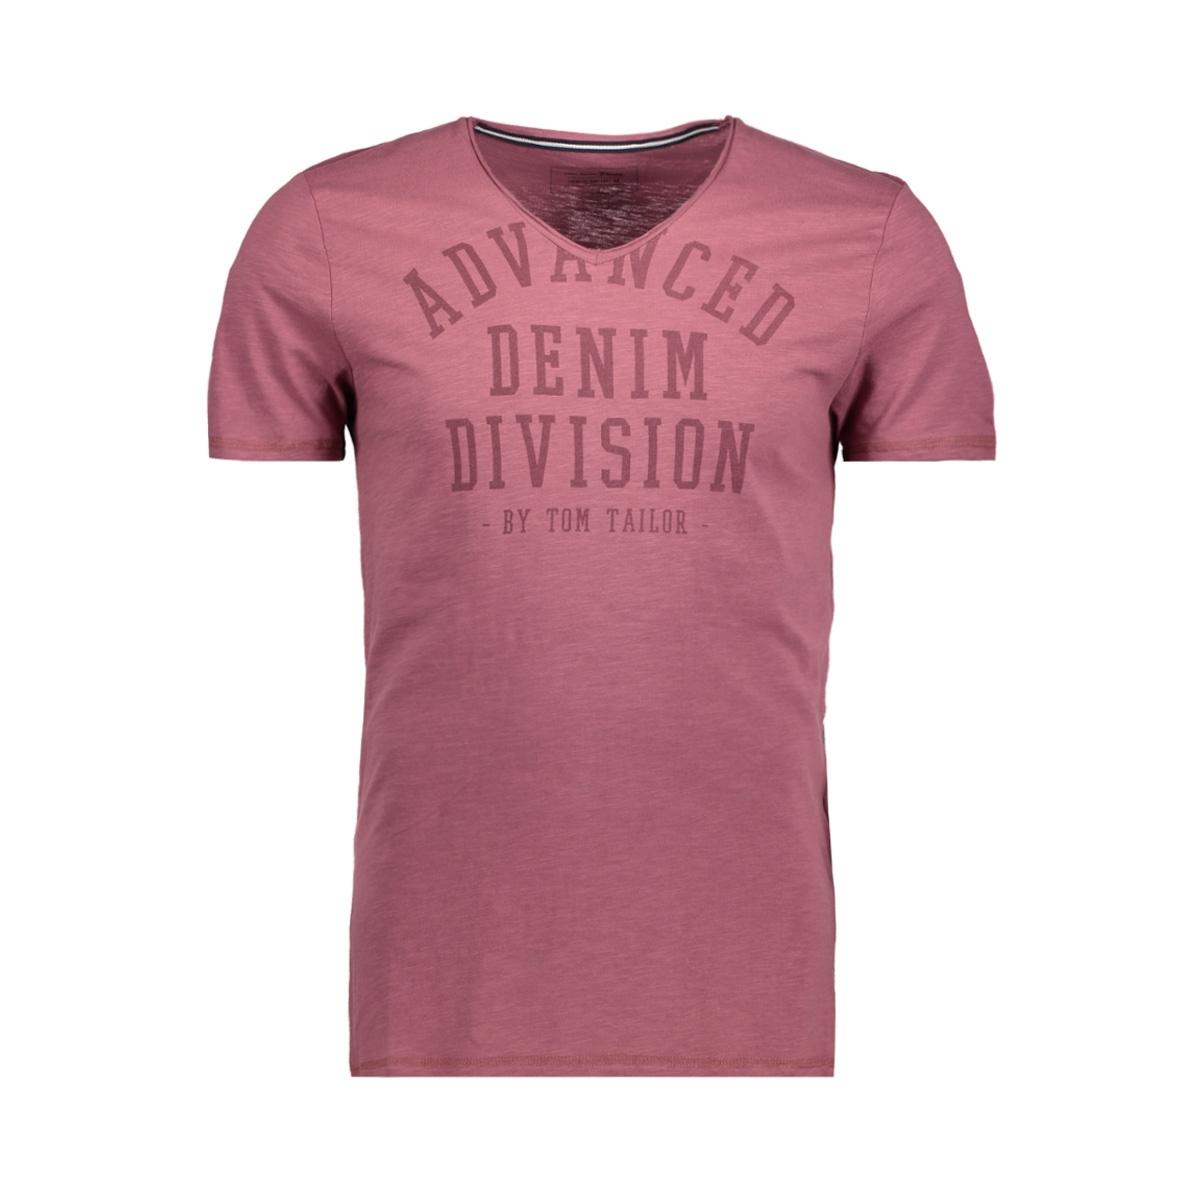 1055305.09.12 tom tailor t-shirt 5744